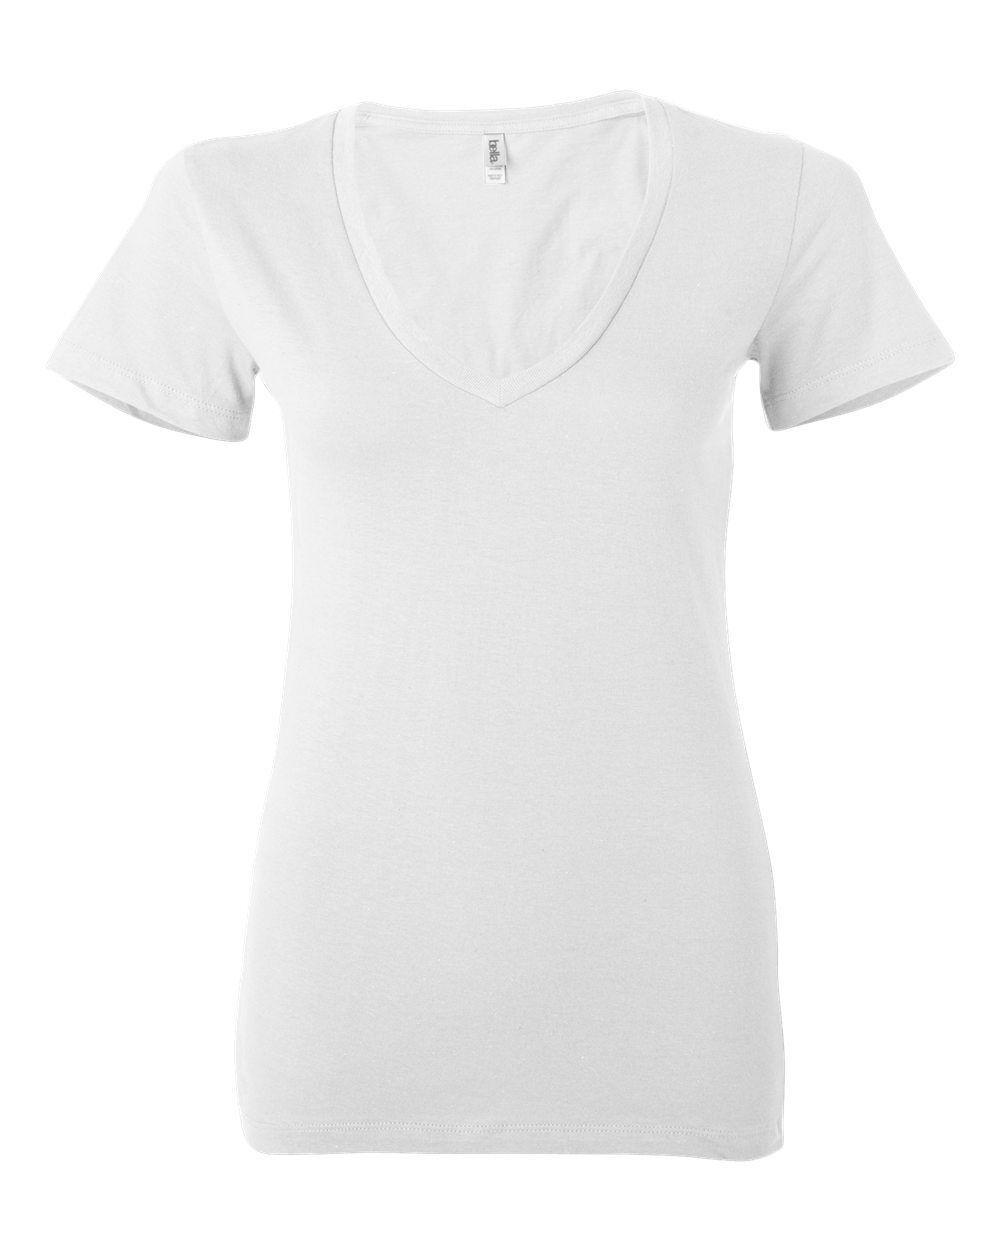 a6773a26640 Details about Bella + Canvas Ladies Junior Fit Jersey Deep V-Neck T-Shirt.  6035